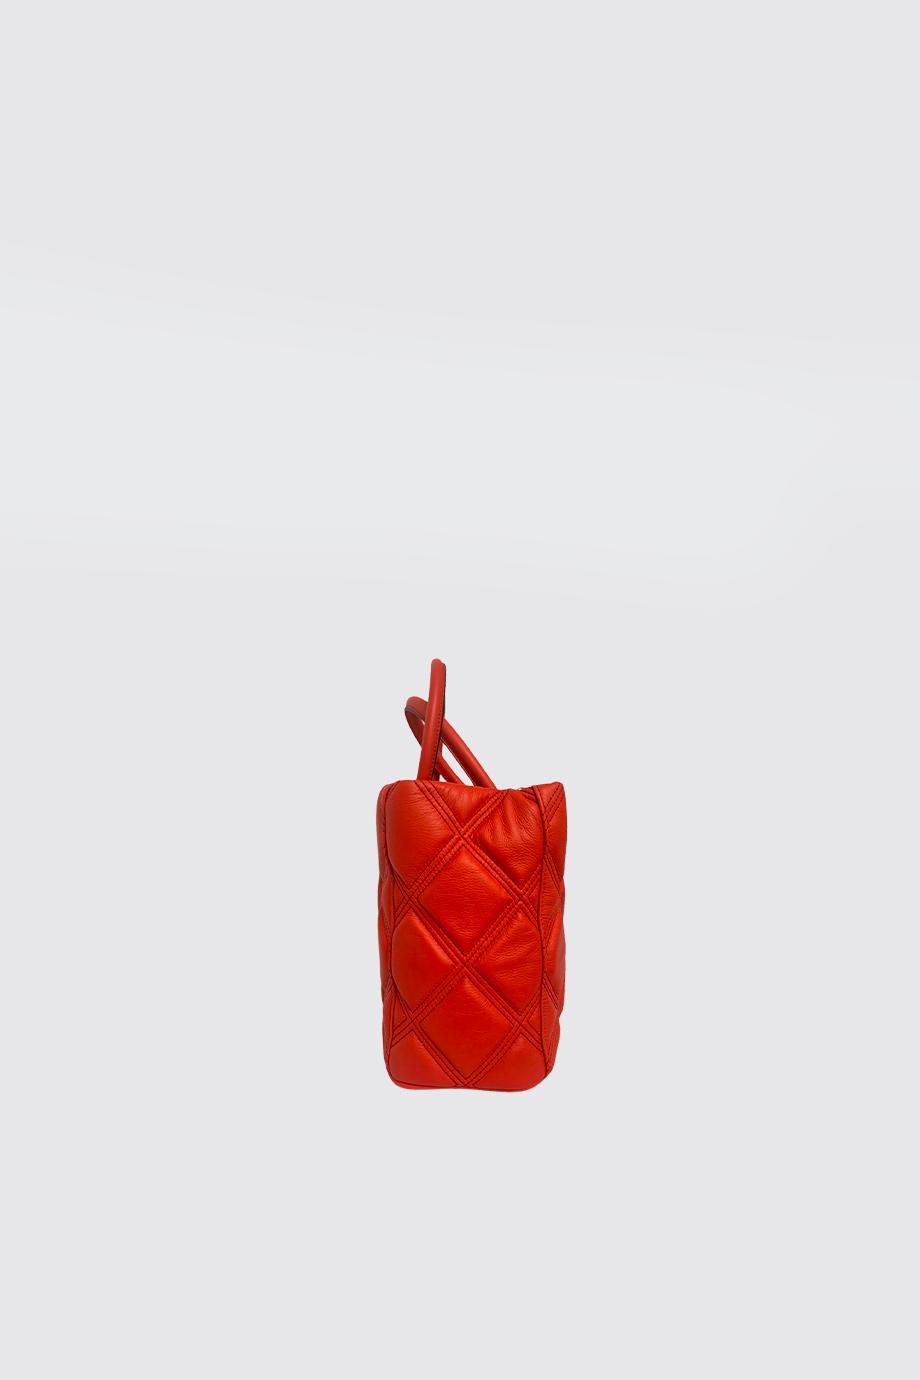 borsa media leila rosso rubino avenue 67